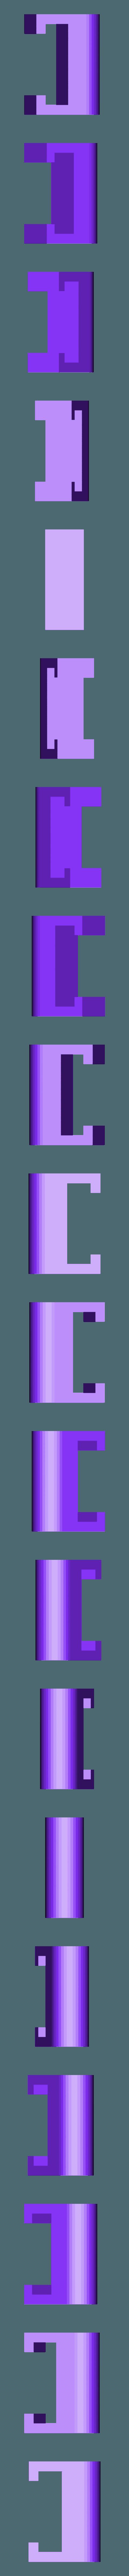 PURGE-TOOL.STL Download free STL file Dremel 3D45 Tool Caddy • 3D print model, mkellsy